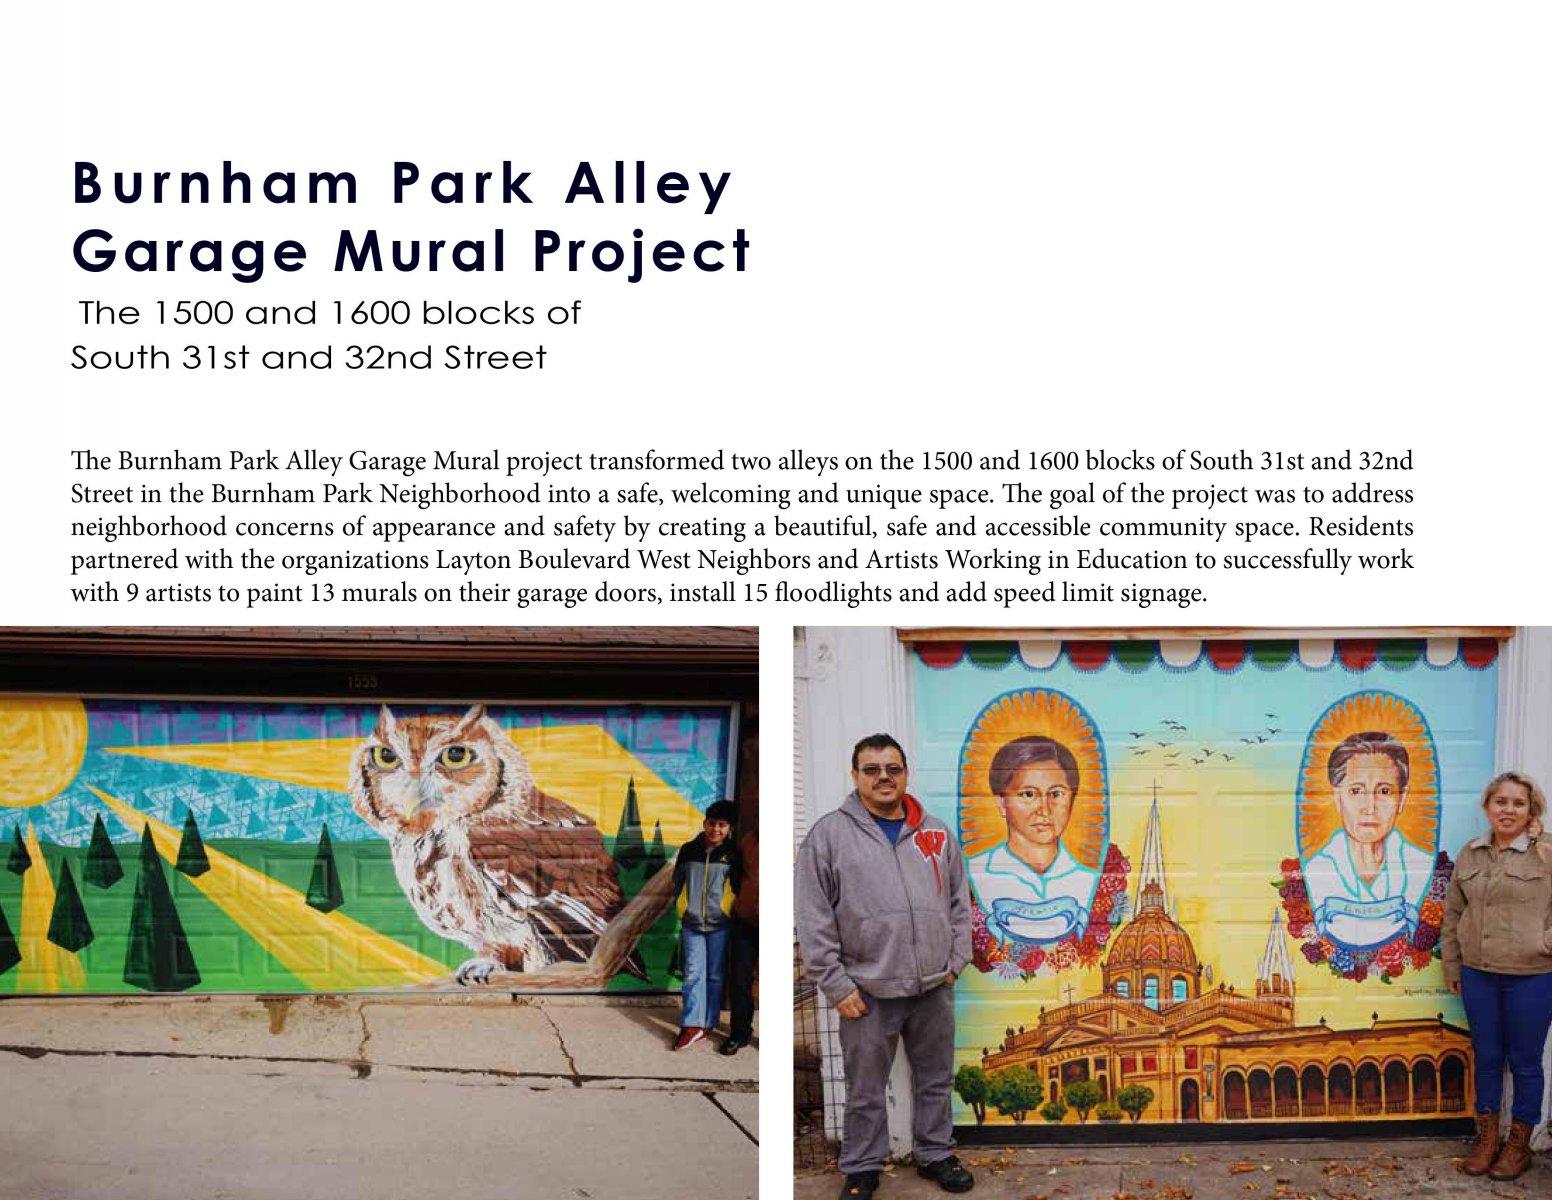 Burnham Park Alley Garage Mural Project